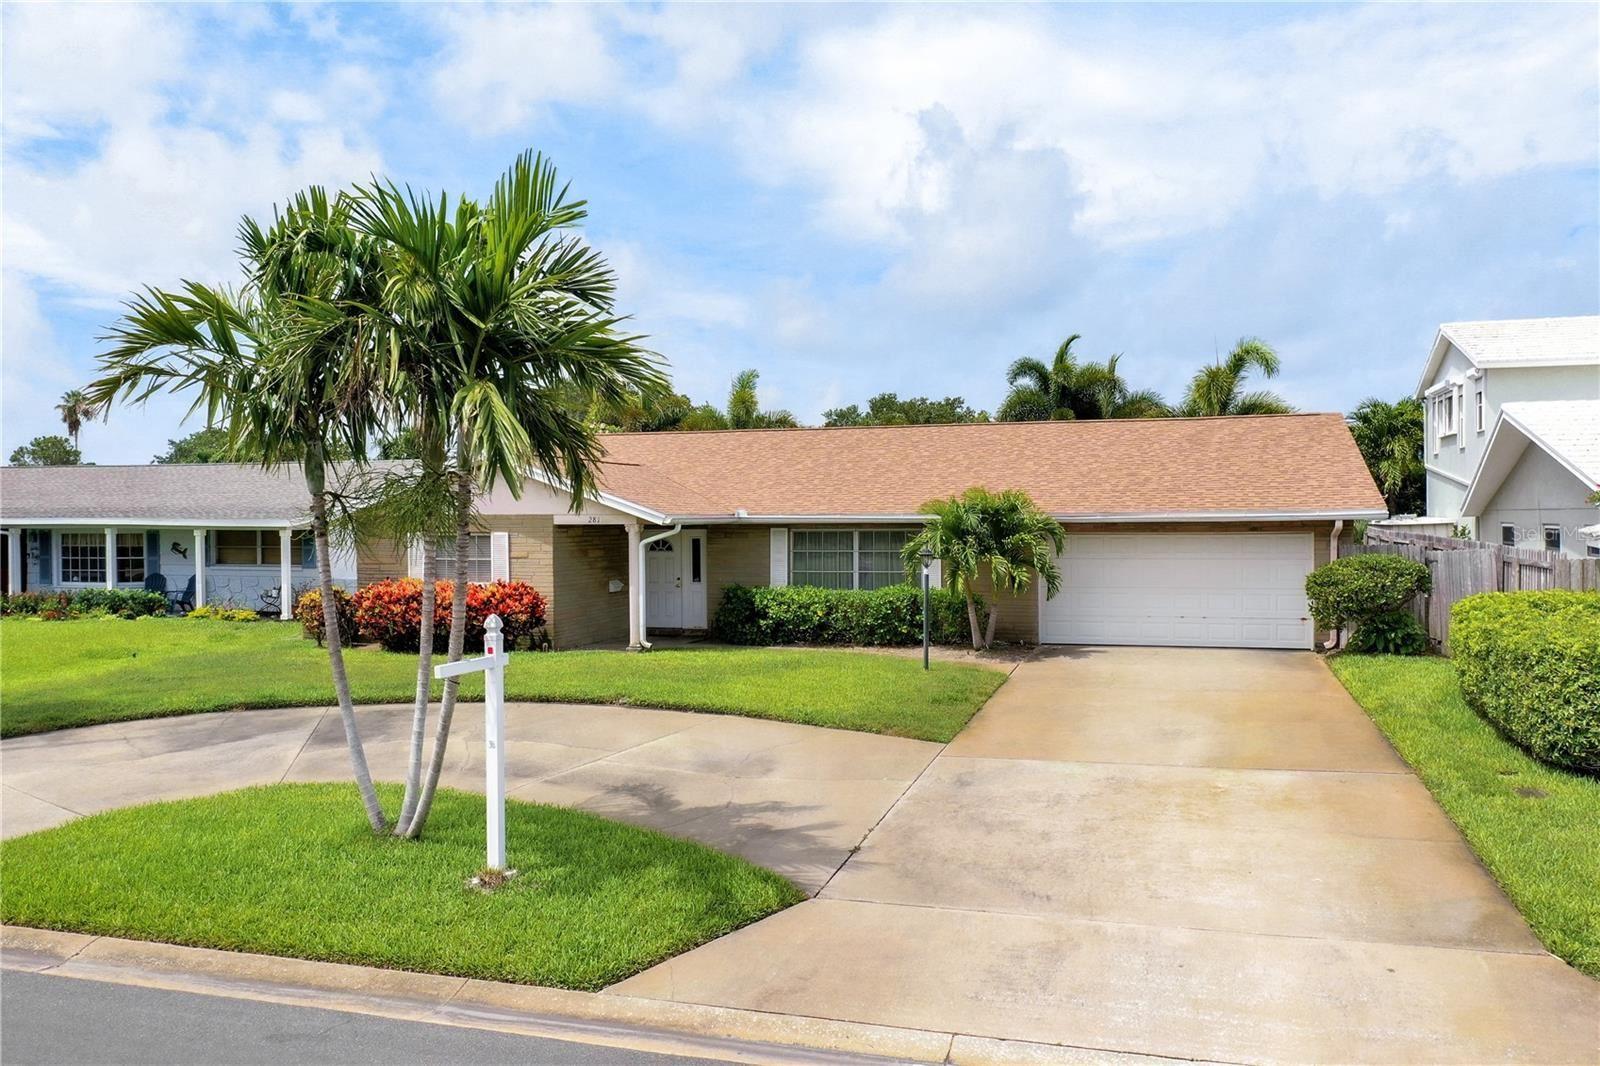 Photo of 281 N JULIA CIRCLE, ST PETE BEACH, FL 33706 (MLS # U8125671)